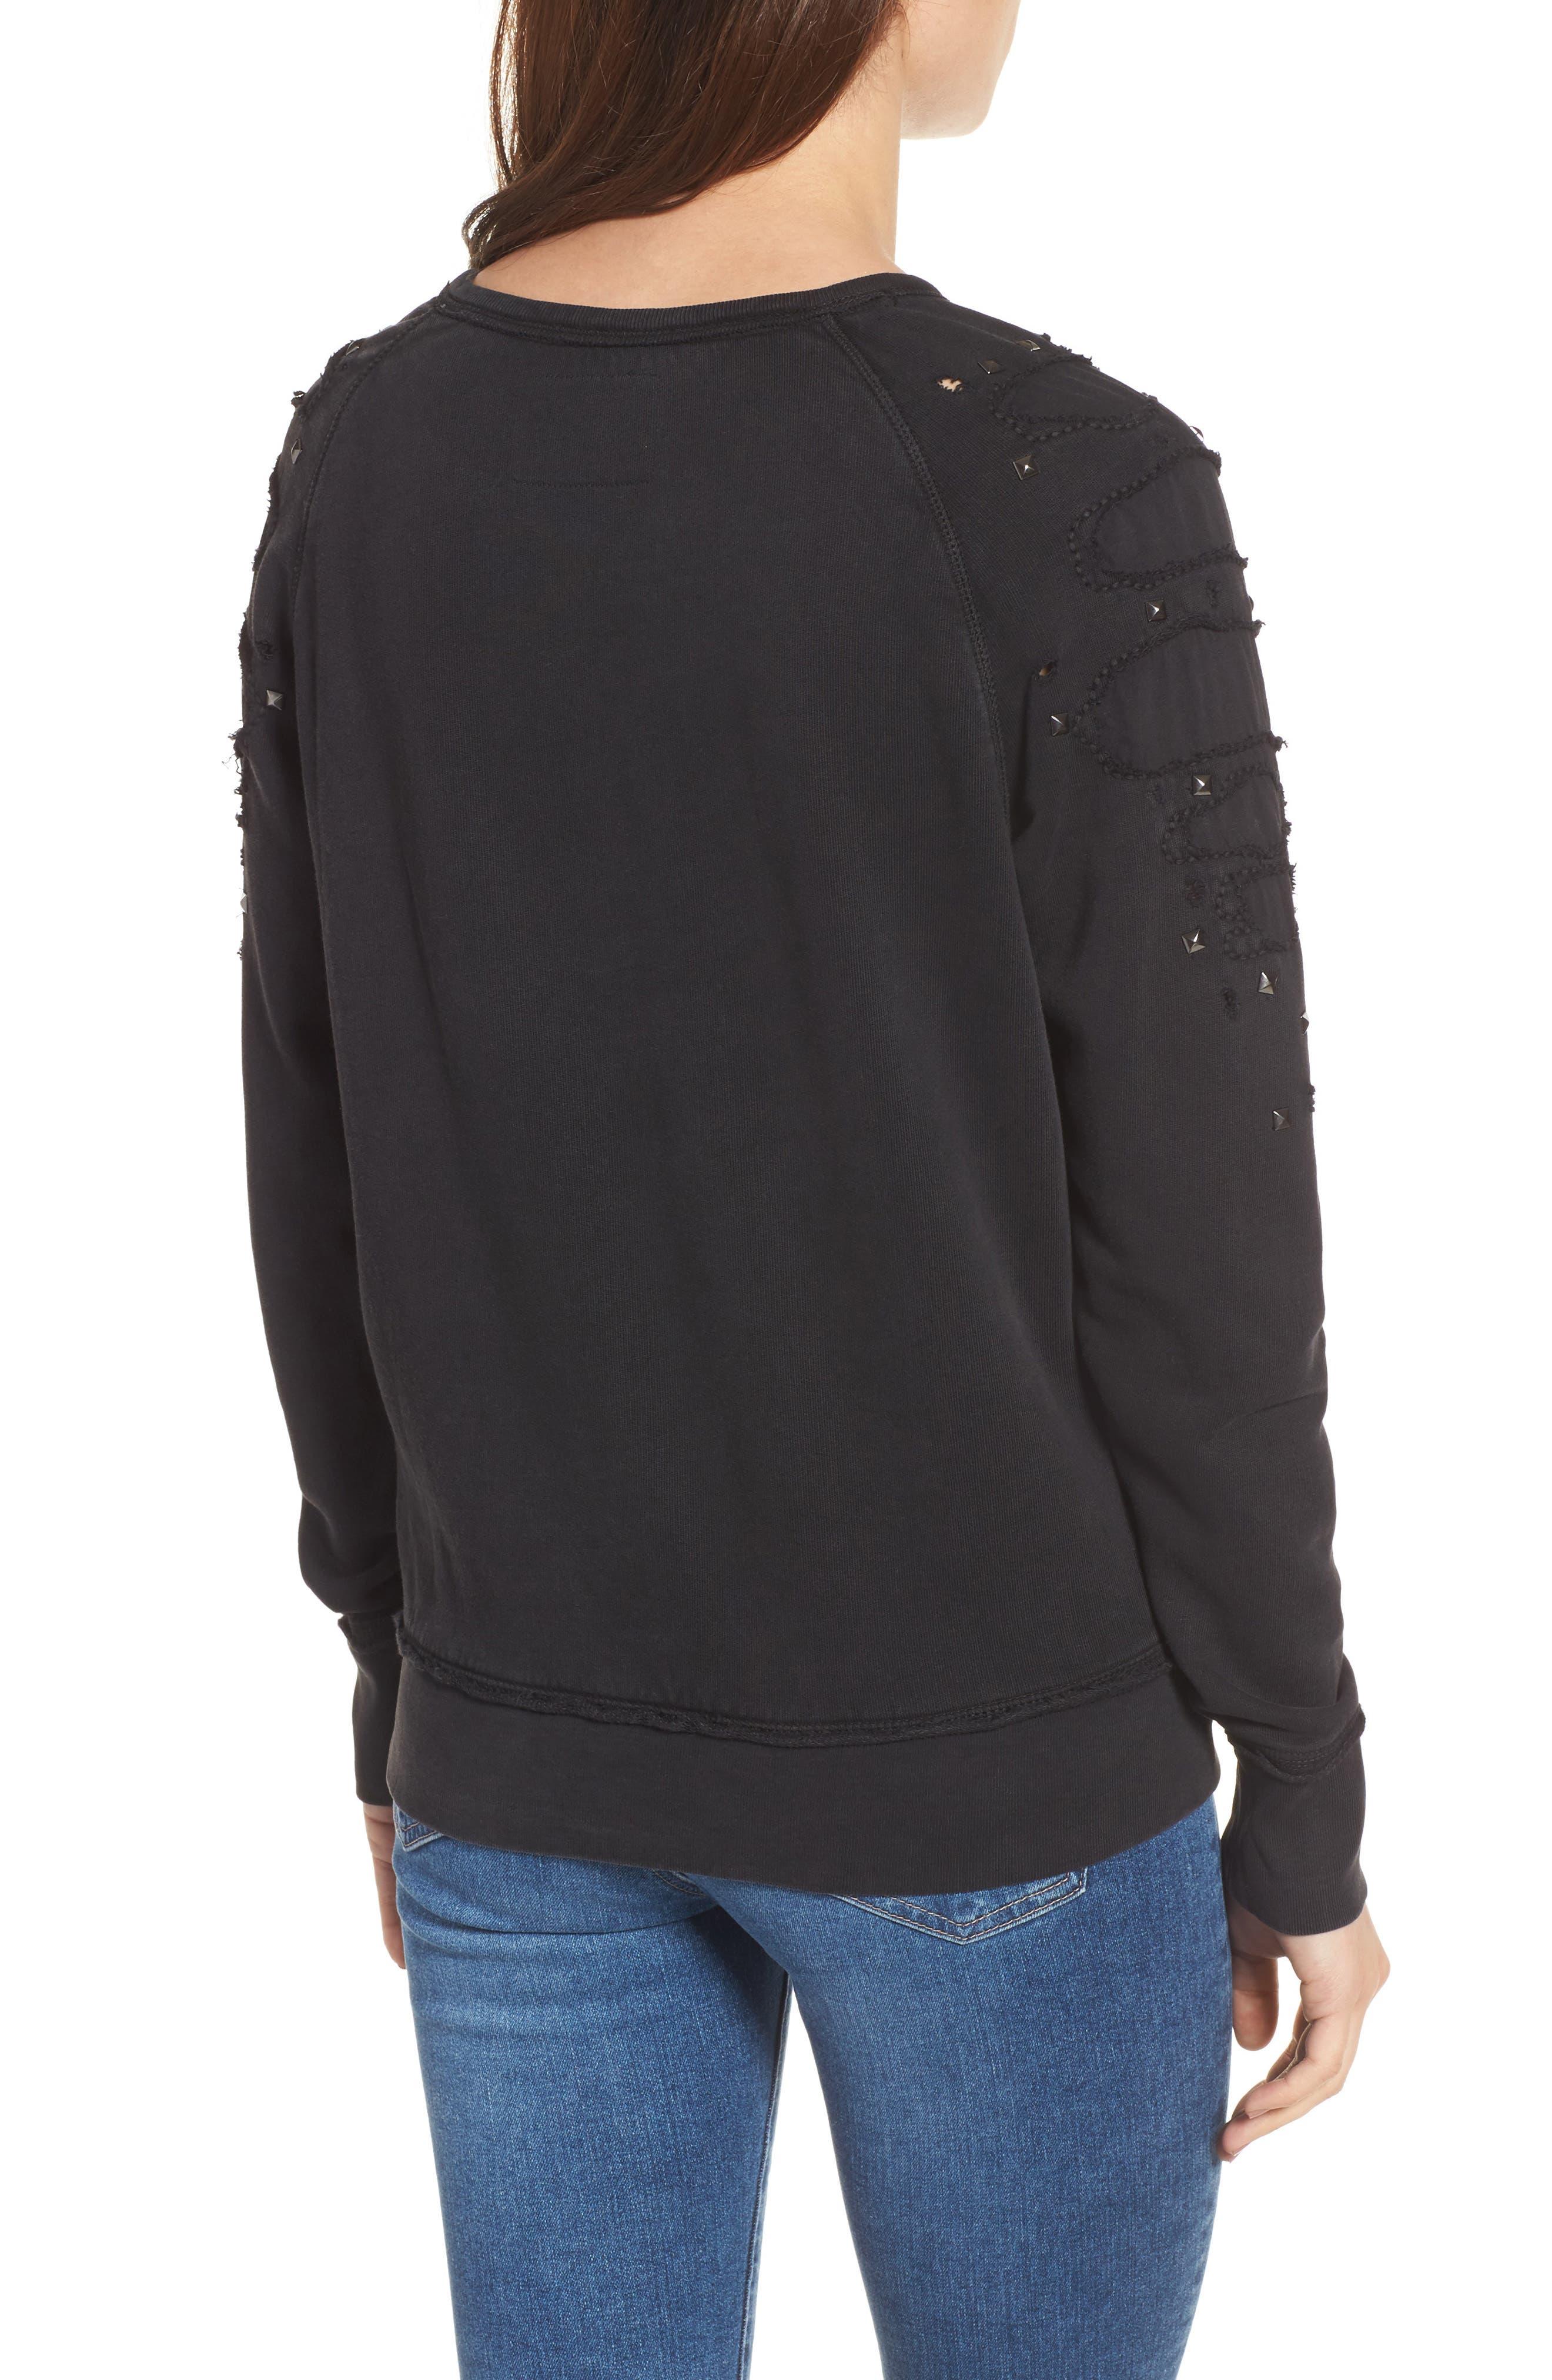 Distressed Boyfriend Sweatshirt,                             Alternate thumbnail 2, color,                             Black